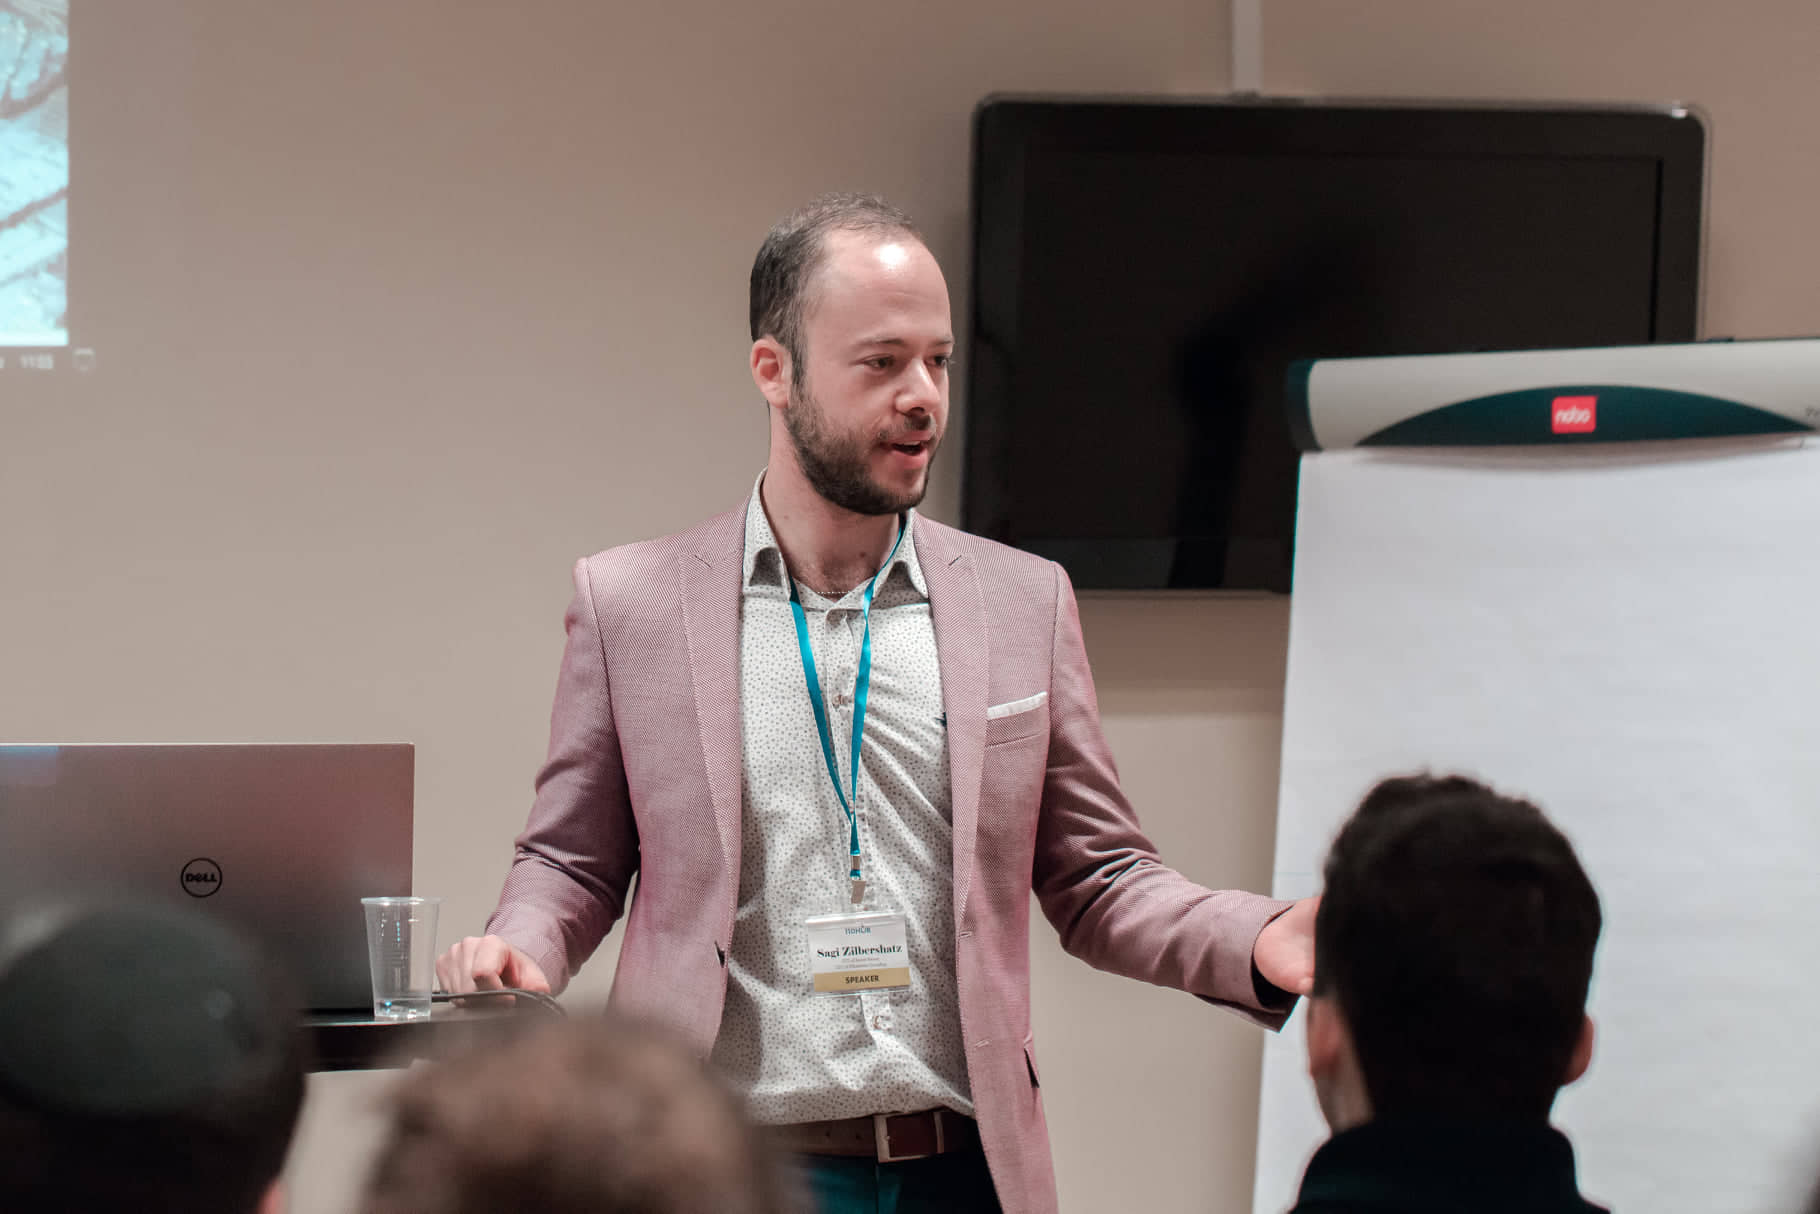 Sagi Zilbershatz public speaking